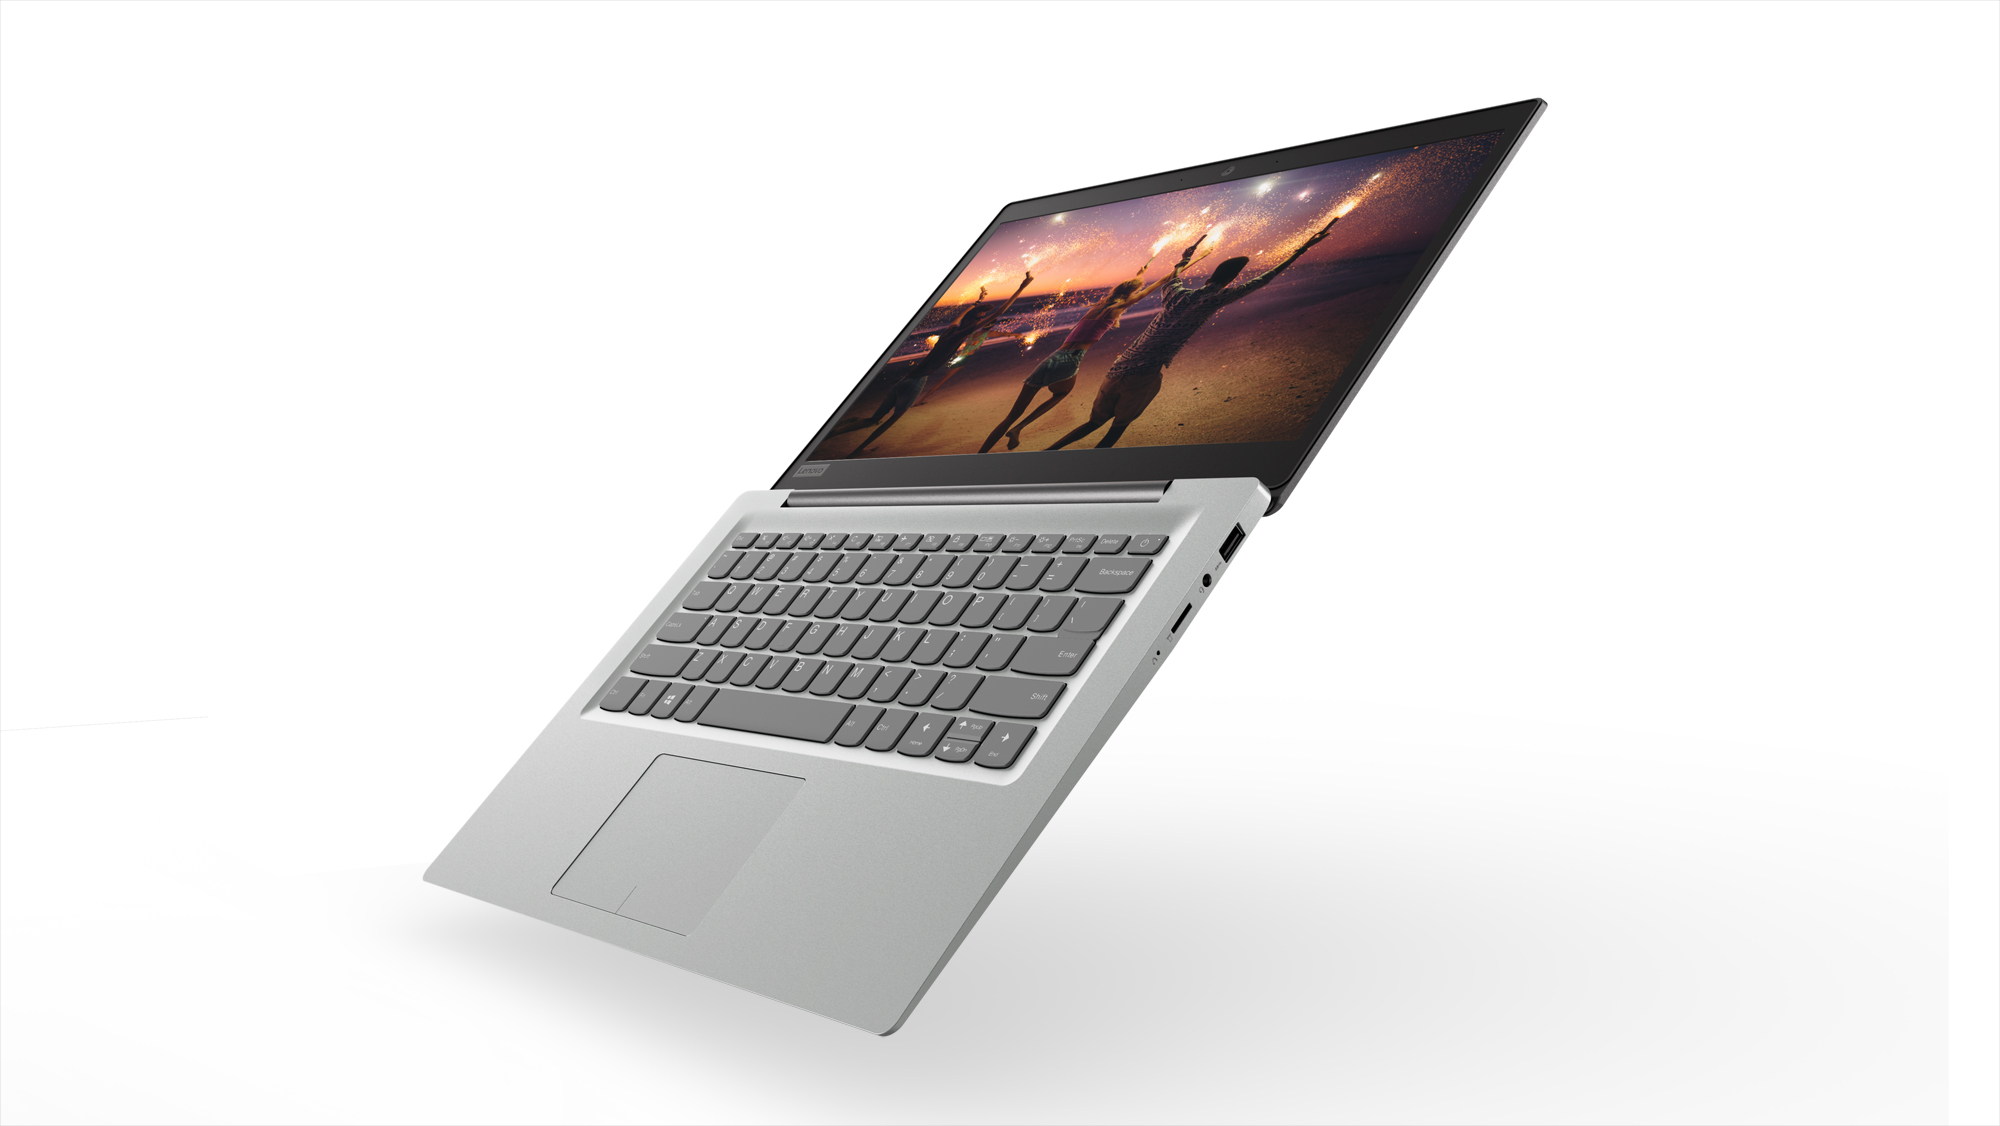 Фото  Ультрабук Lenovo ideapad 120S-14 Mineral Grey (81A500BRRA)